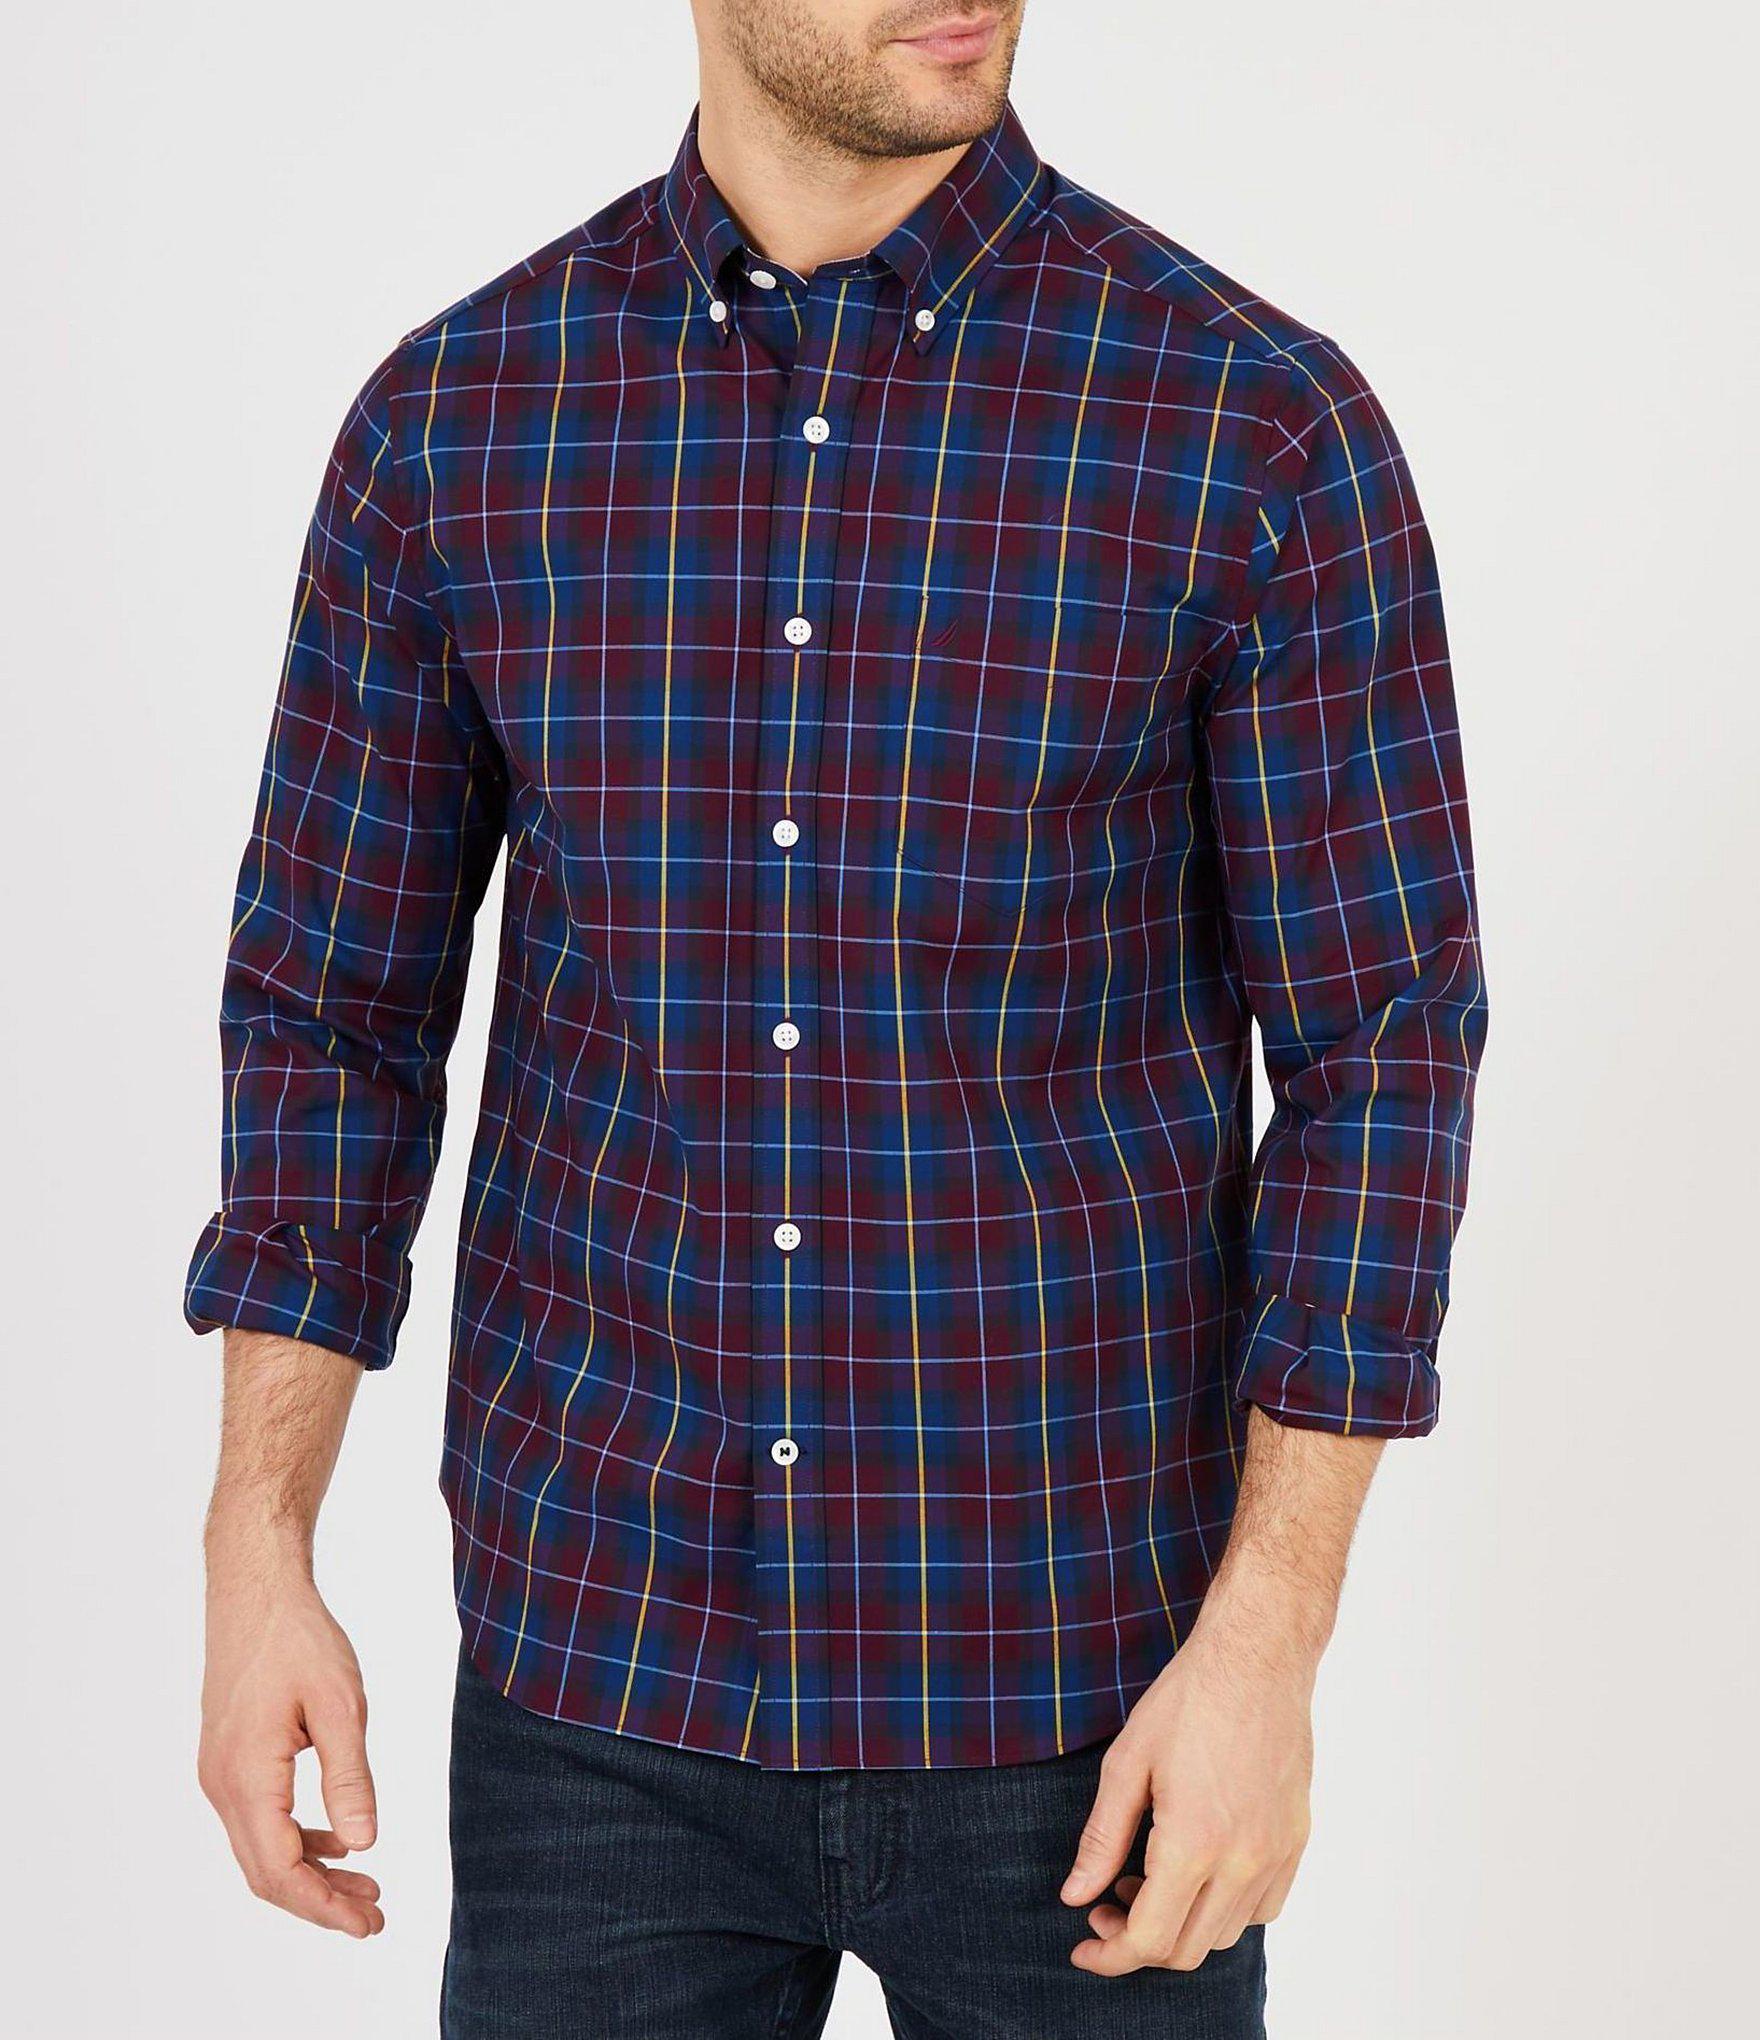 5ead167b4186ee Nautica. Men's Blue Big & Tall Plaid Wrinkle-resistant Long-sleeve Woven  Shirt